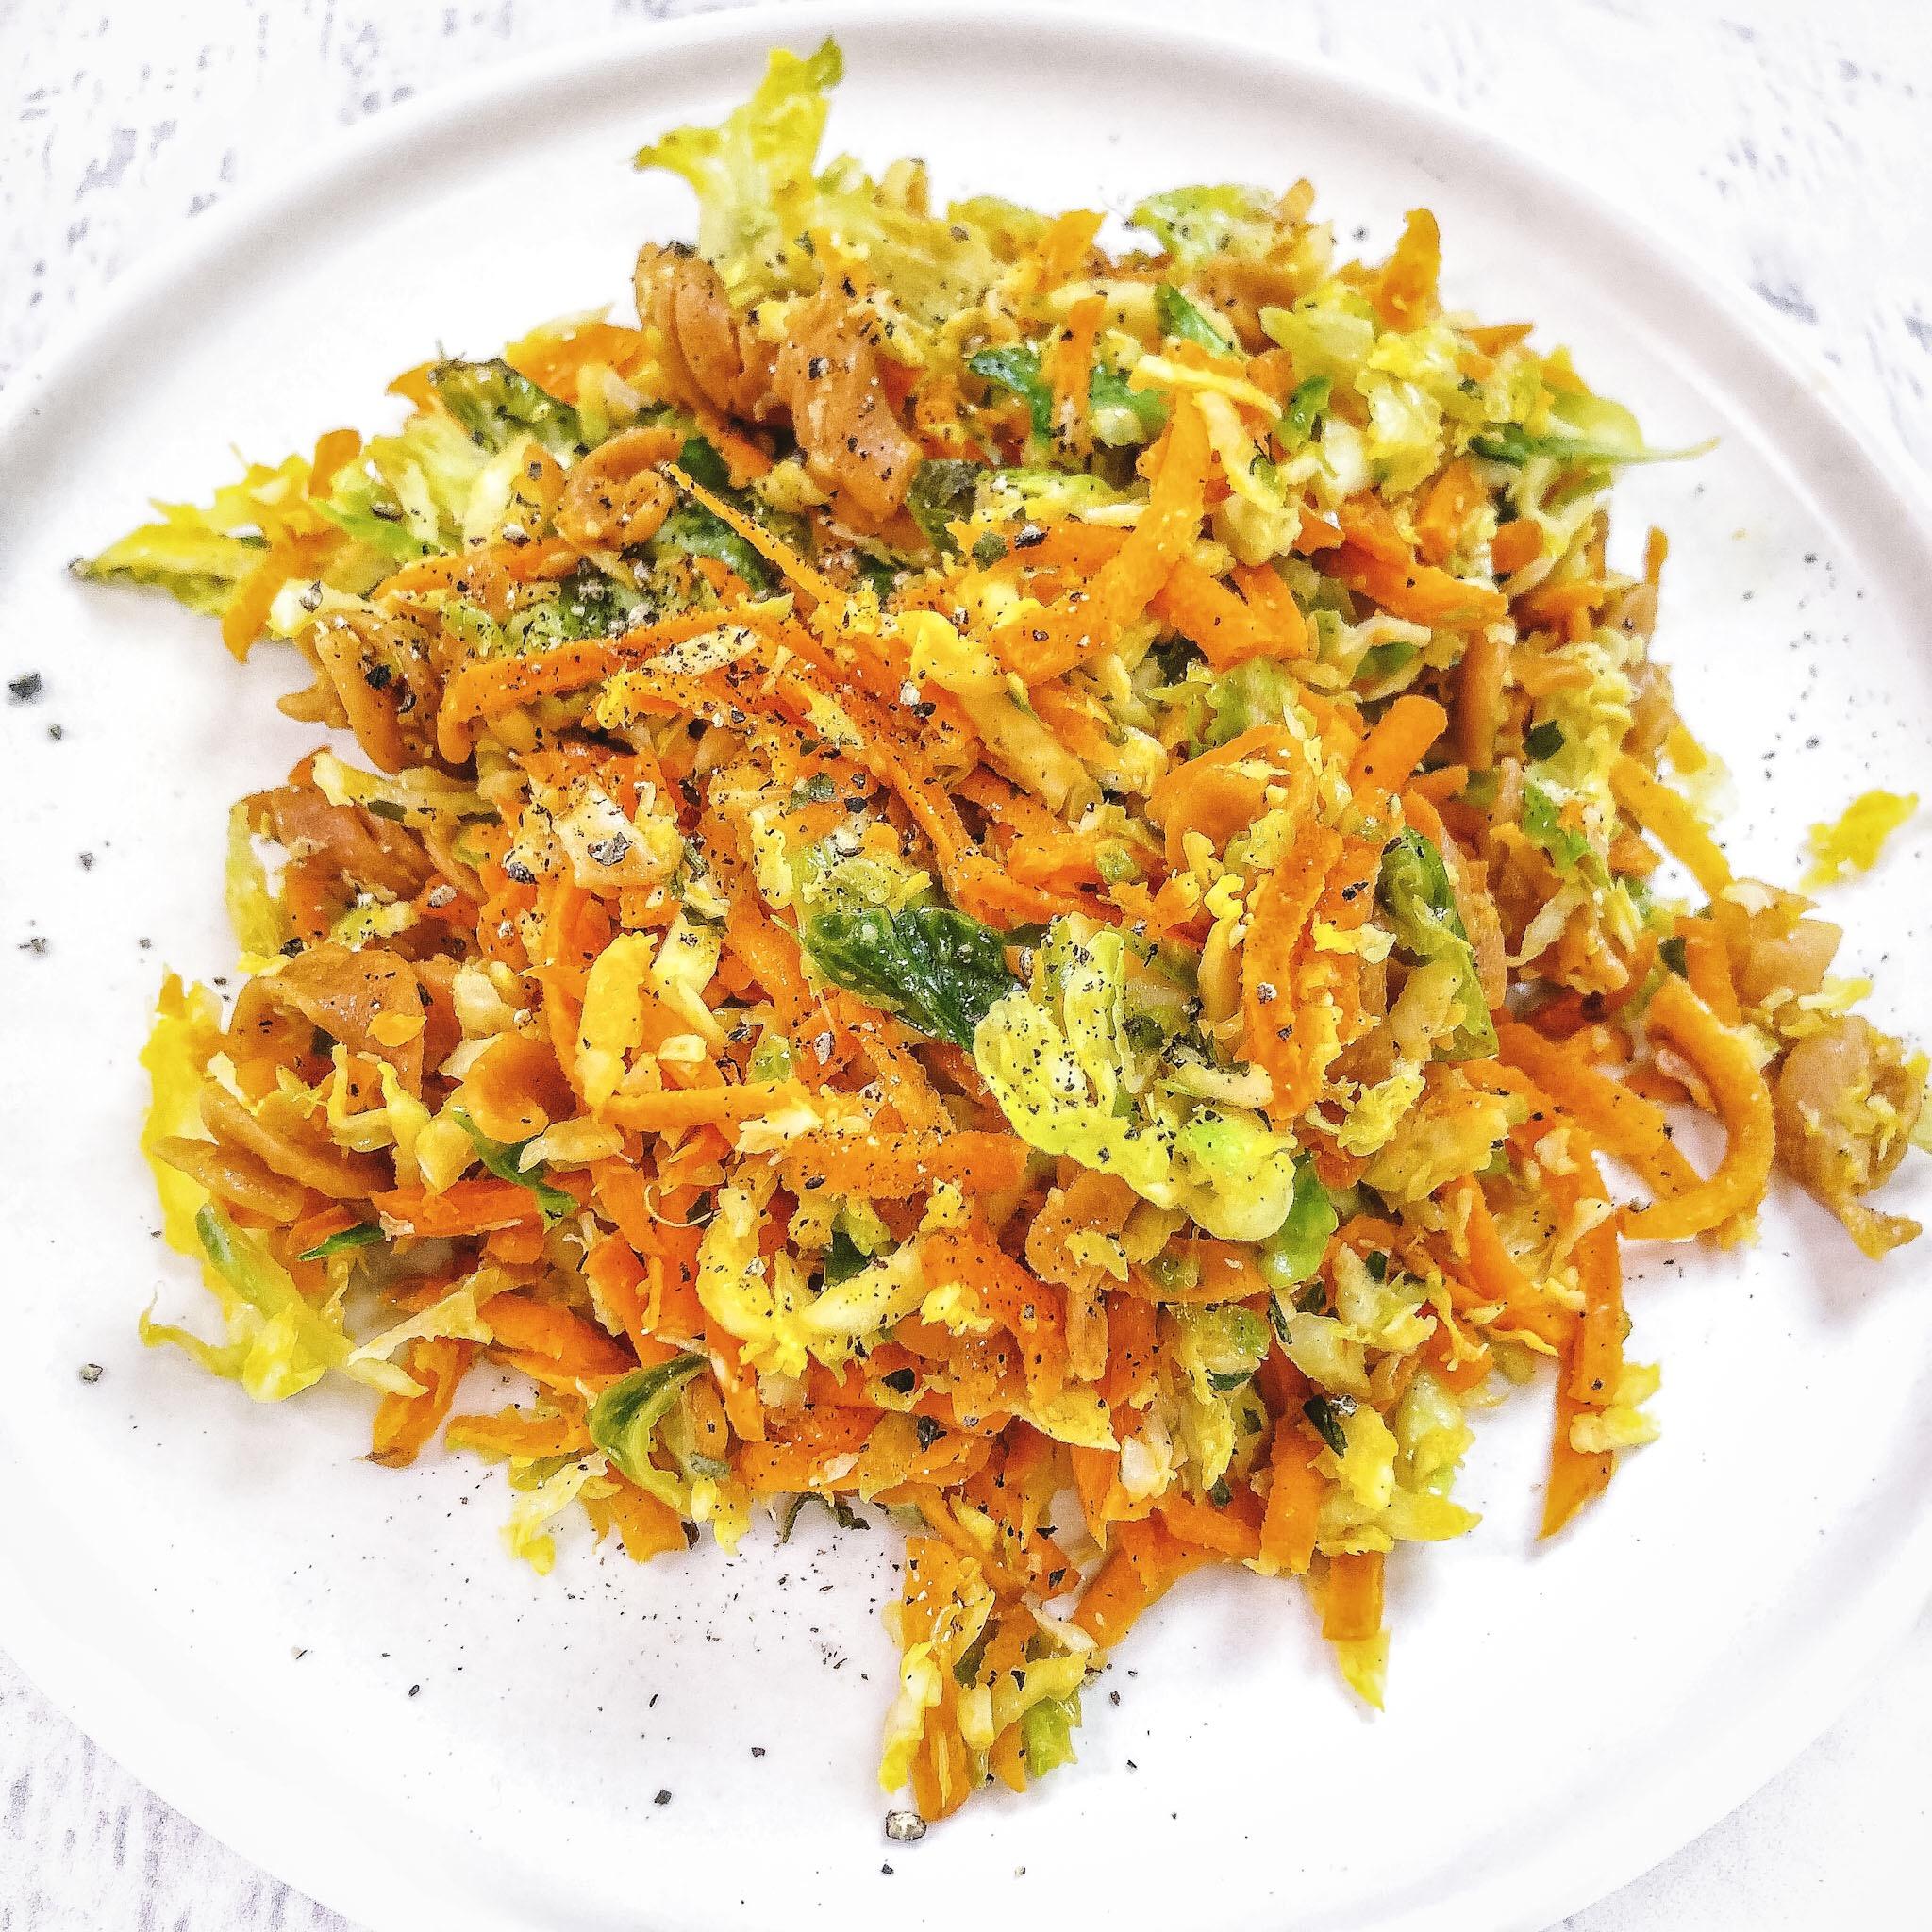 carrot & brussels pasta.jpg